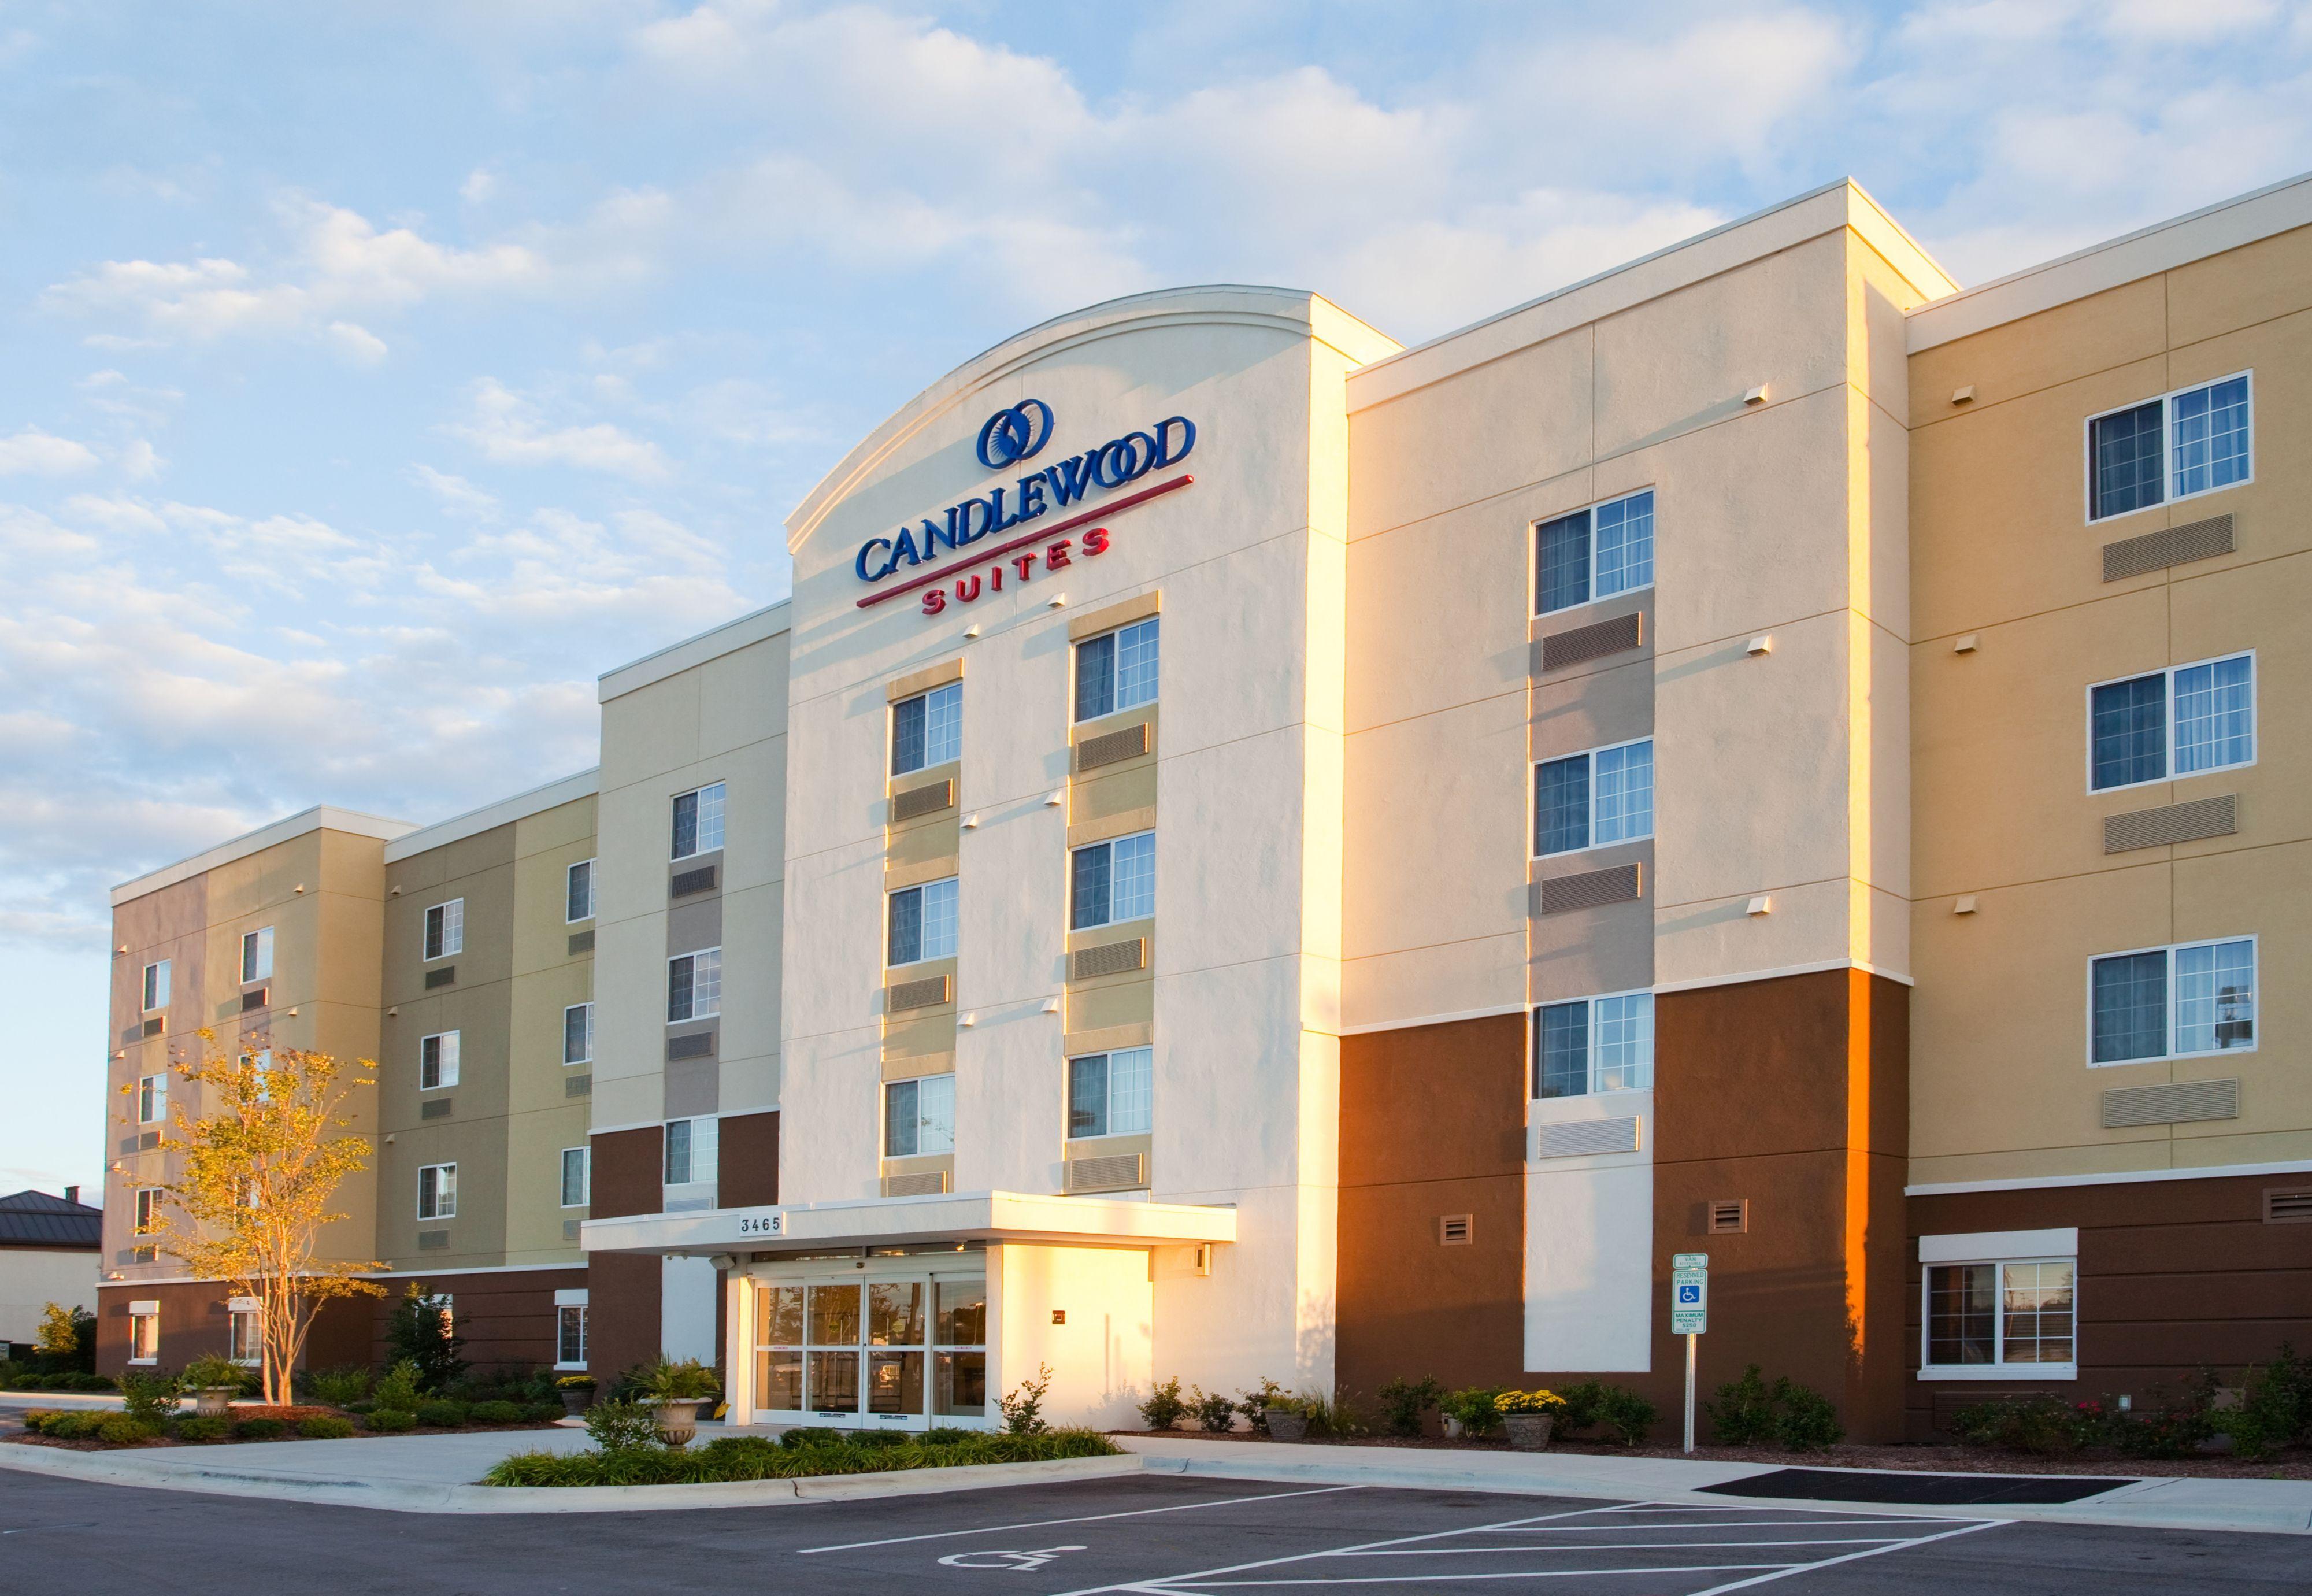 Candlewood Suites Morgantown Univ West Virginia Westover